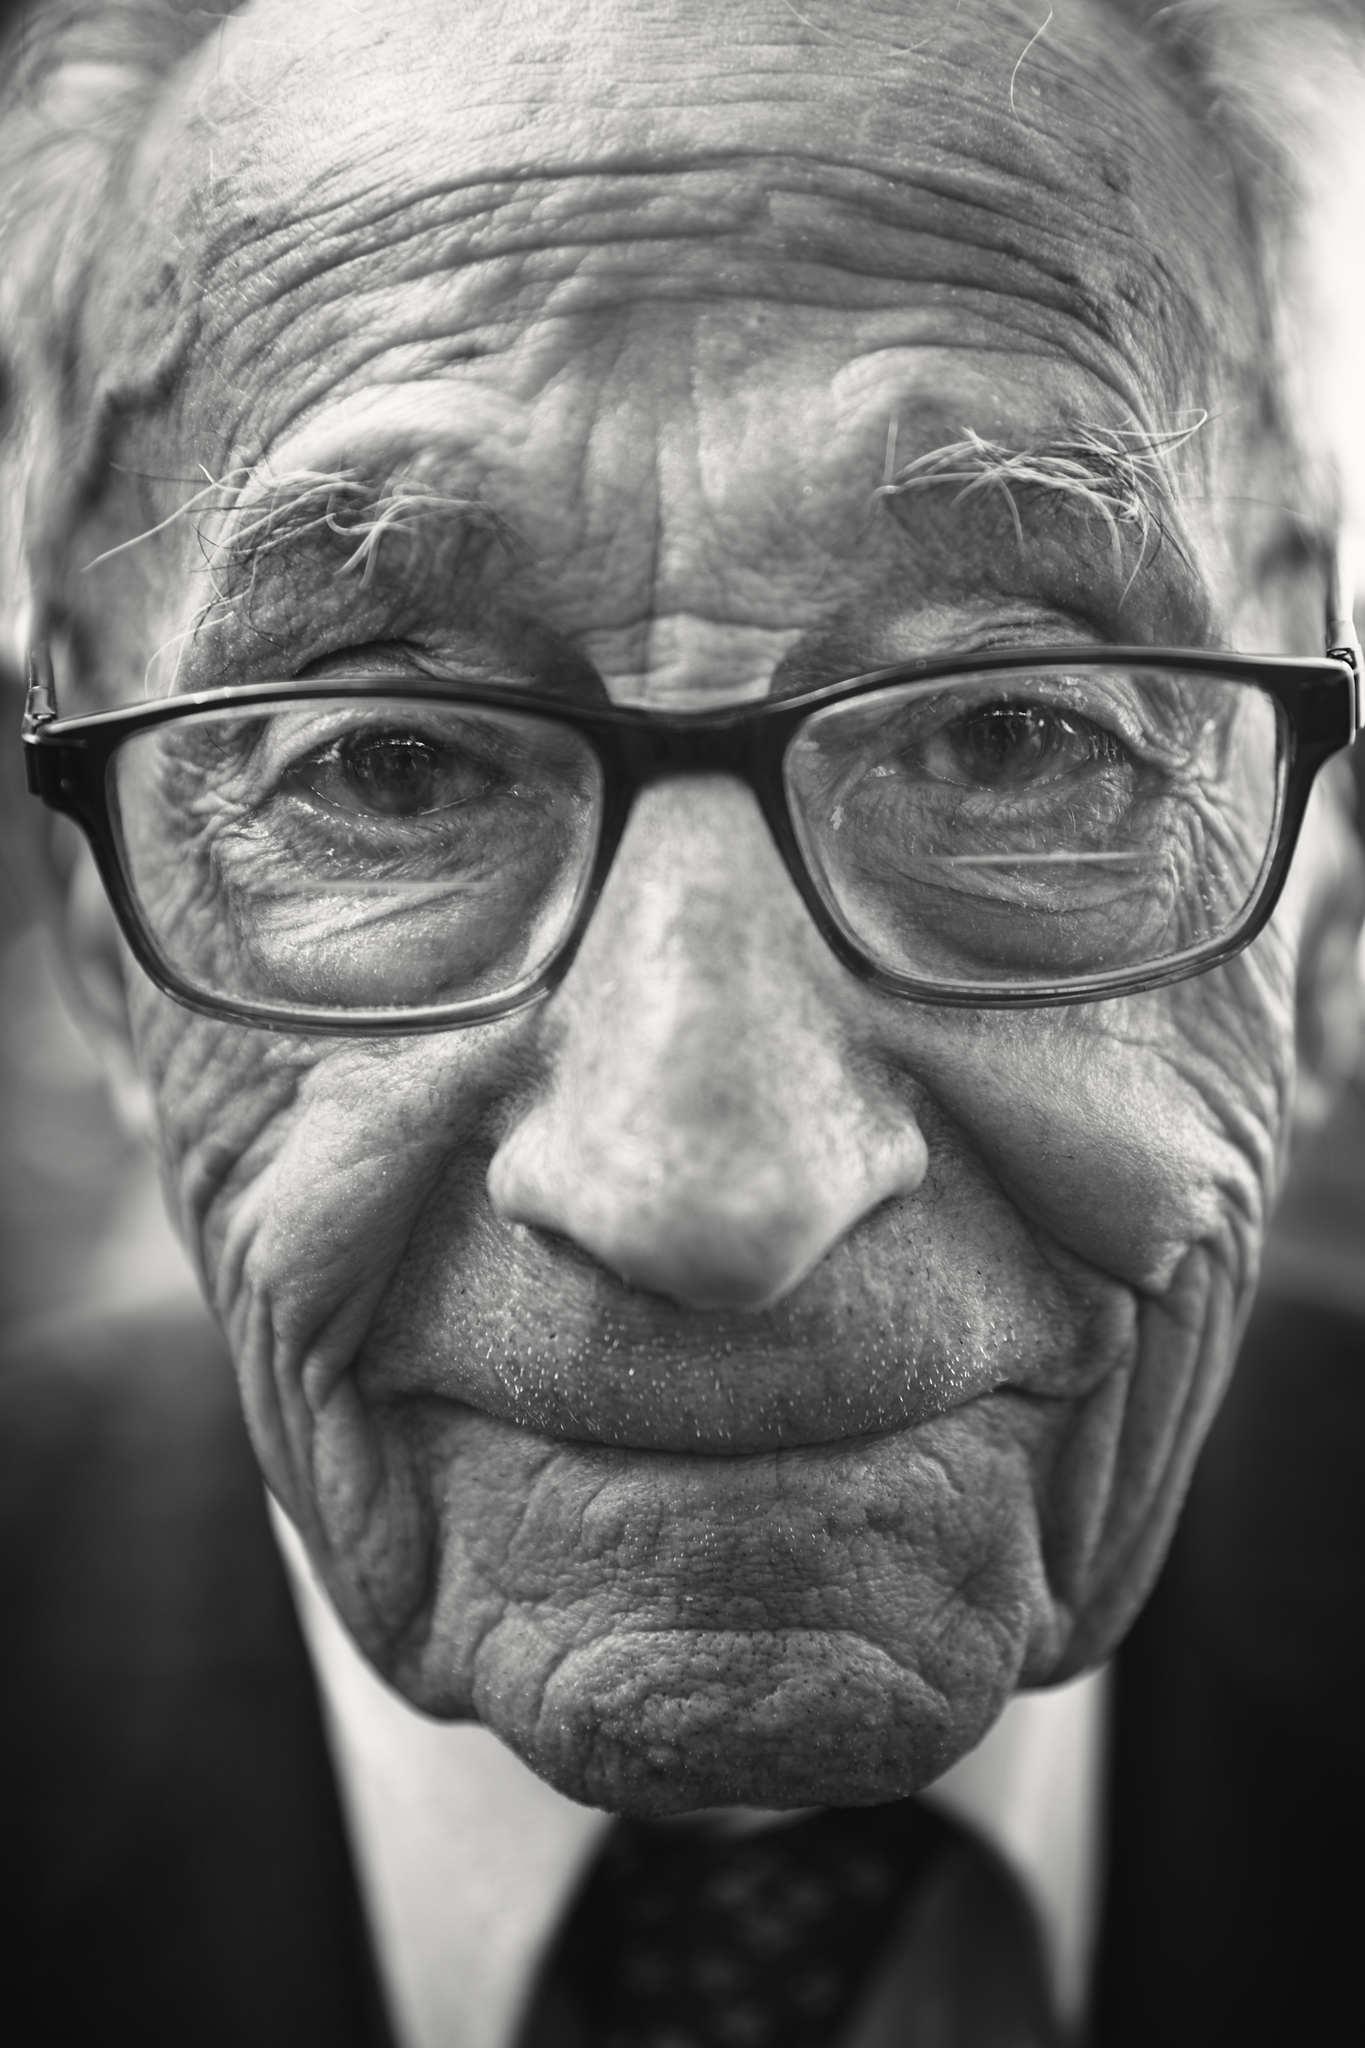 D-DAY VETERANS, FRANCE - JUNE 6: Joe Schida (97 yrs old), from Pennsylvania, a member of the Amphibi